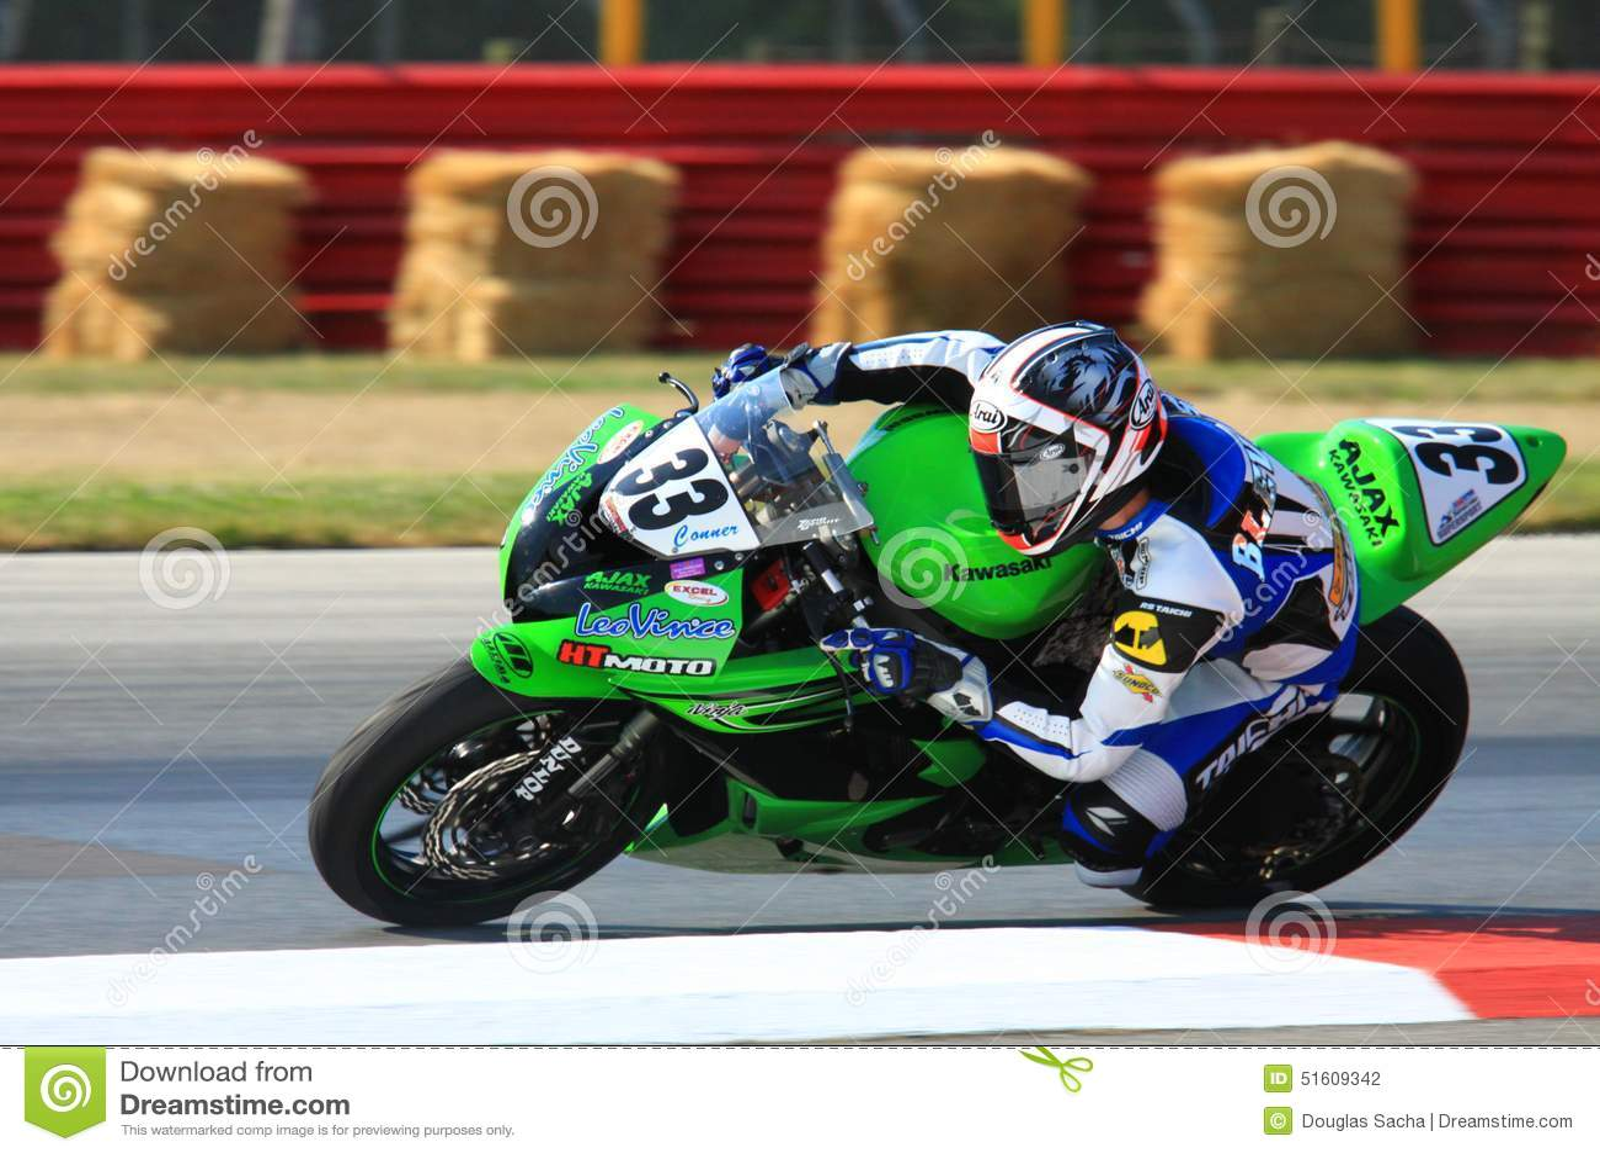 kawasaki racing bike editorial photography - image: 51609342